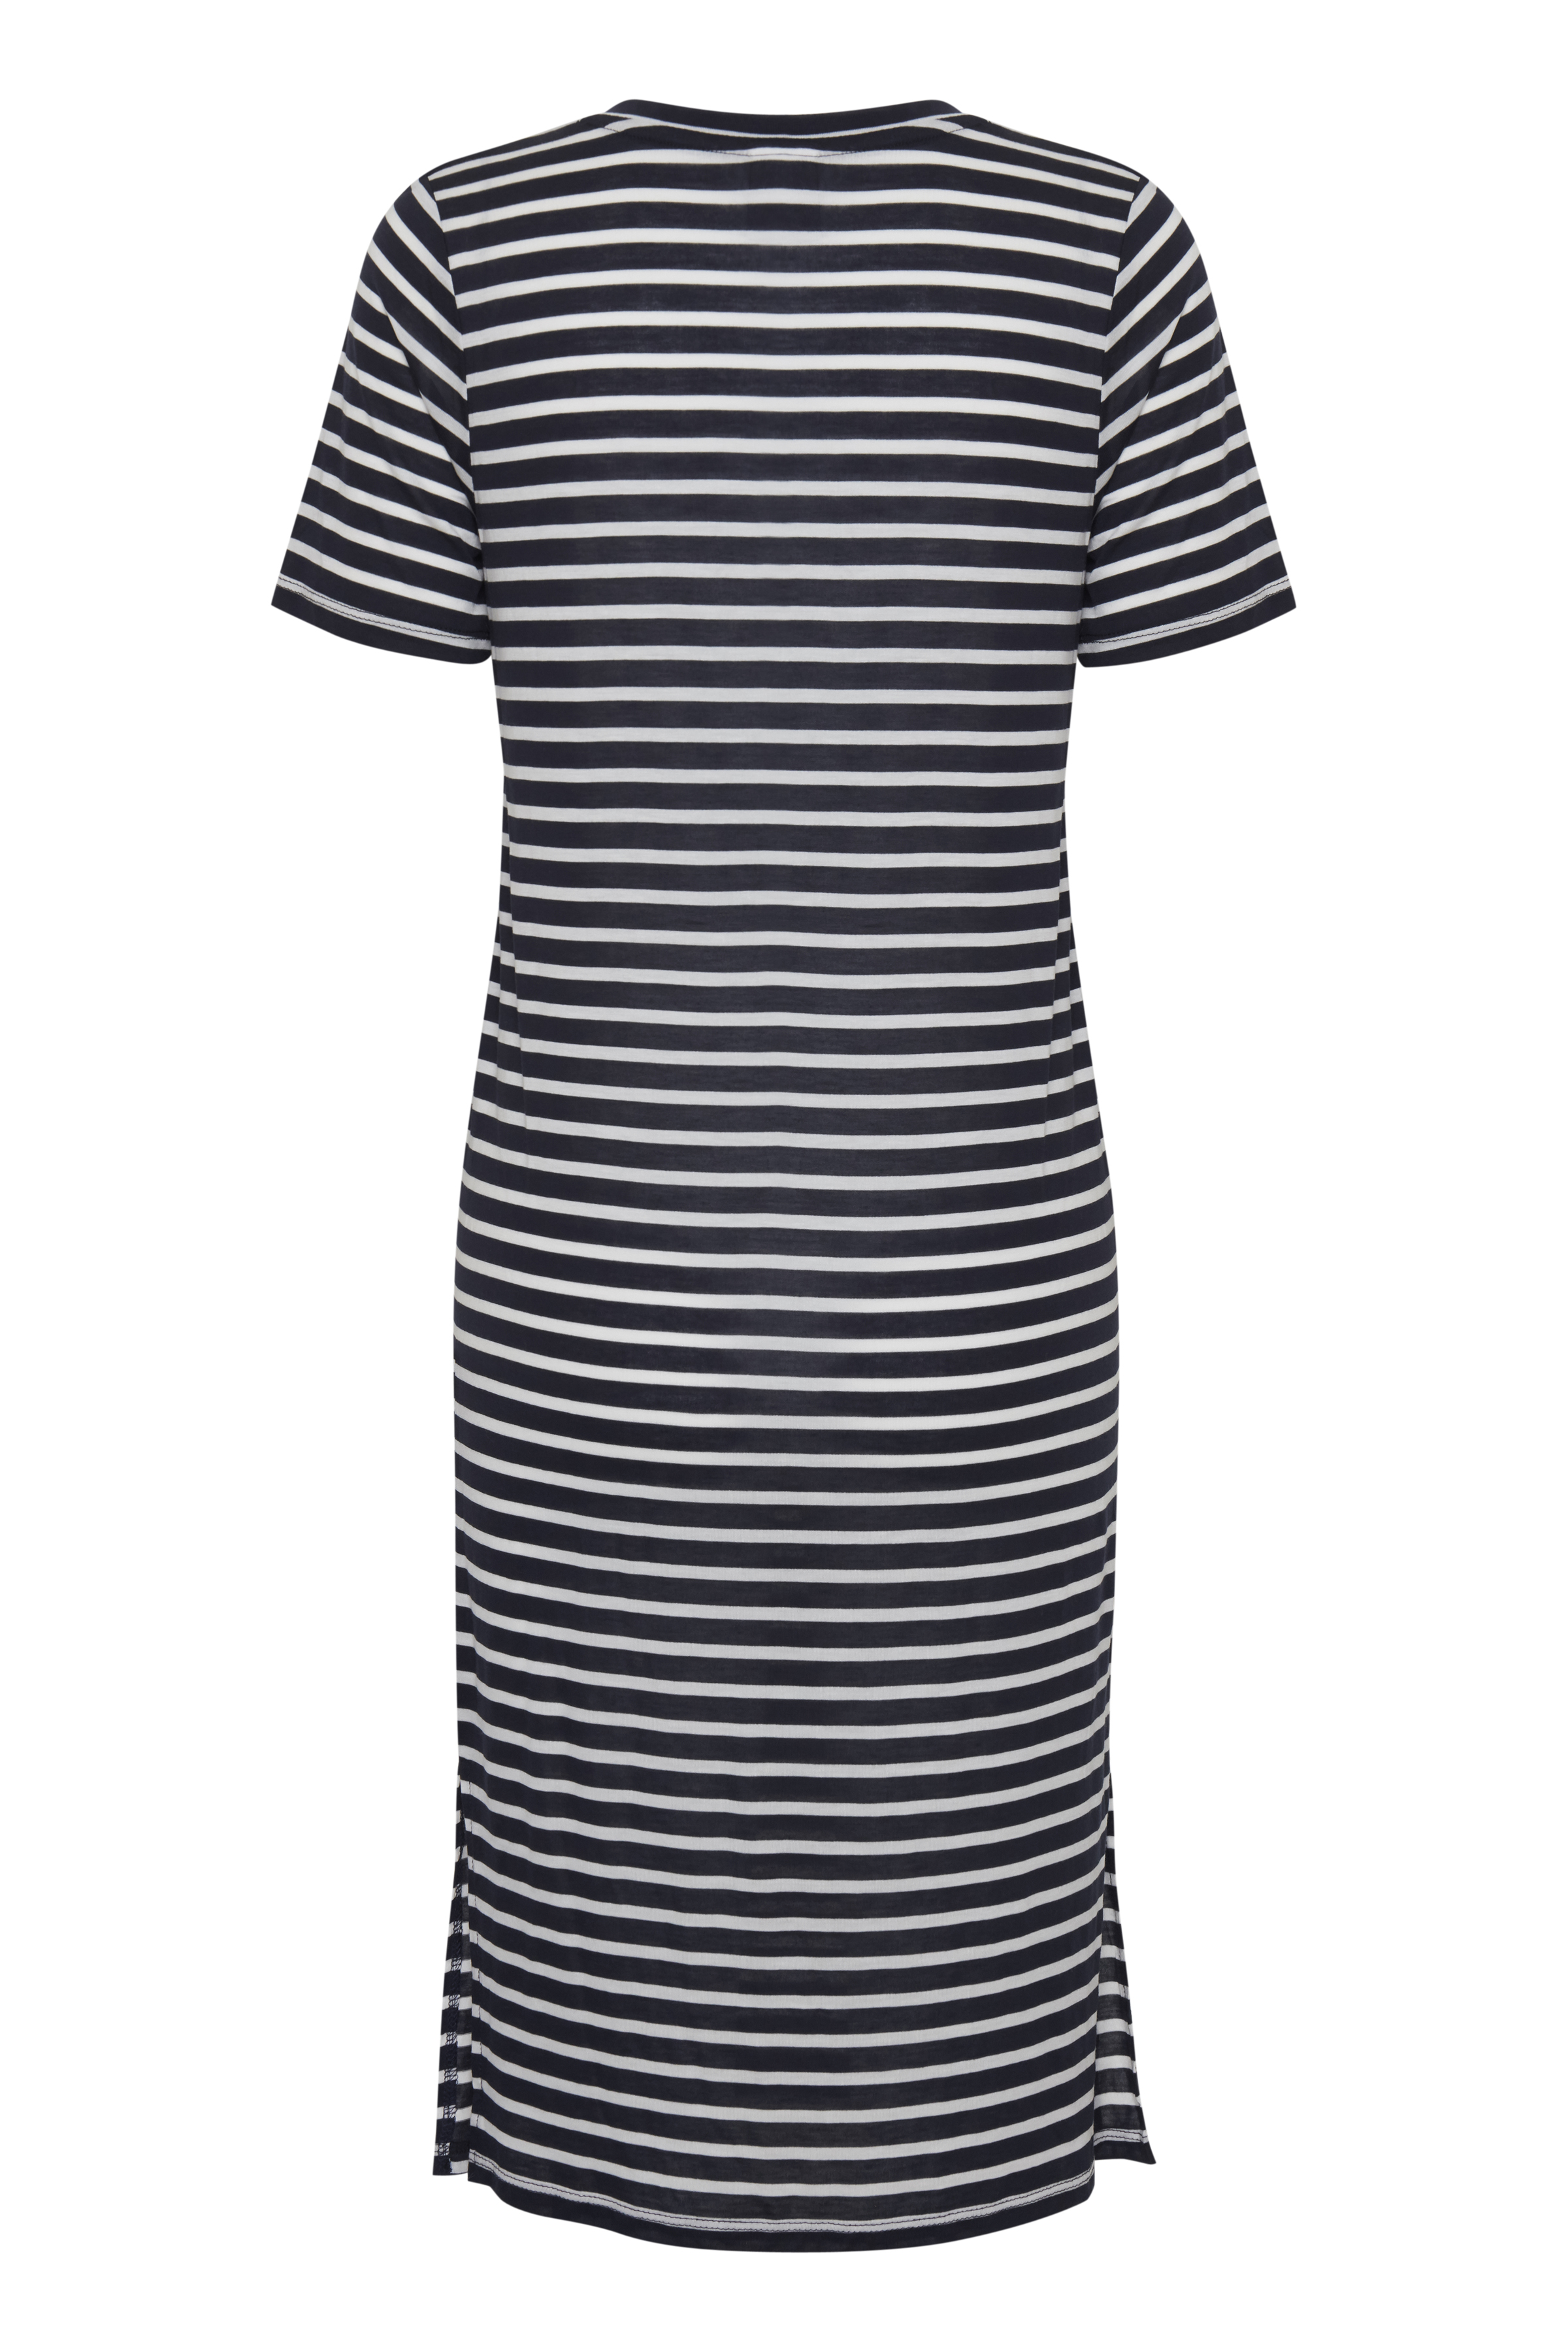 Total Eclipse Jerseykjole – Køb Total Eclipse Jerseykjole fra str. XS-XL her